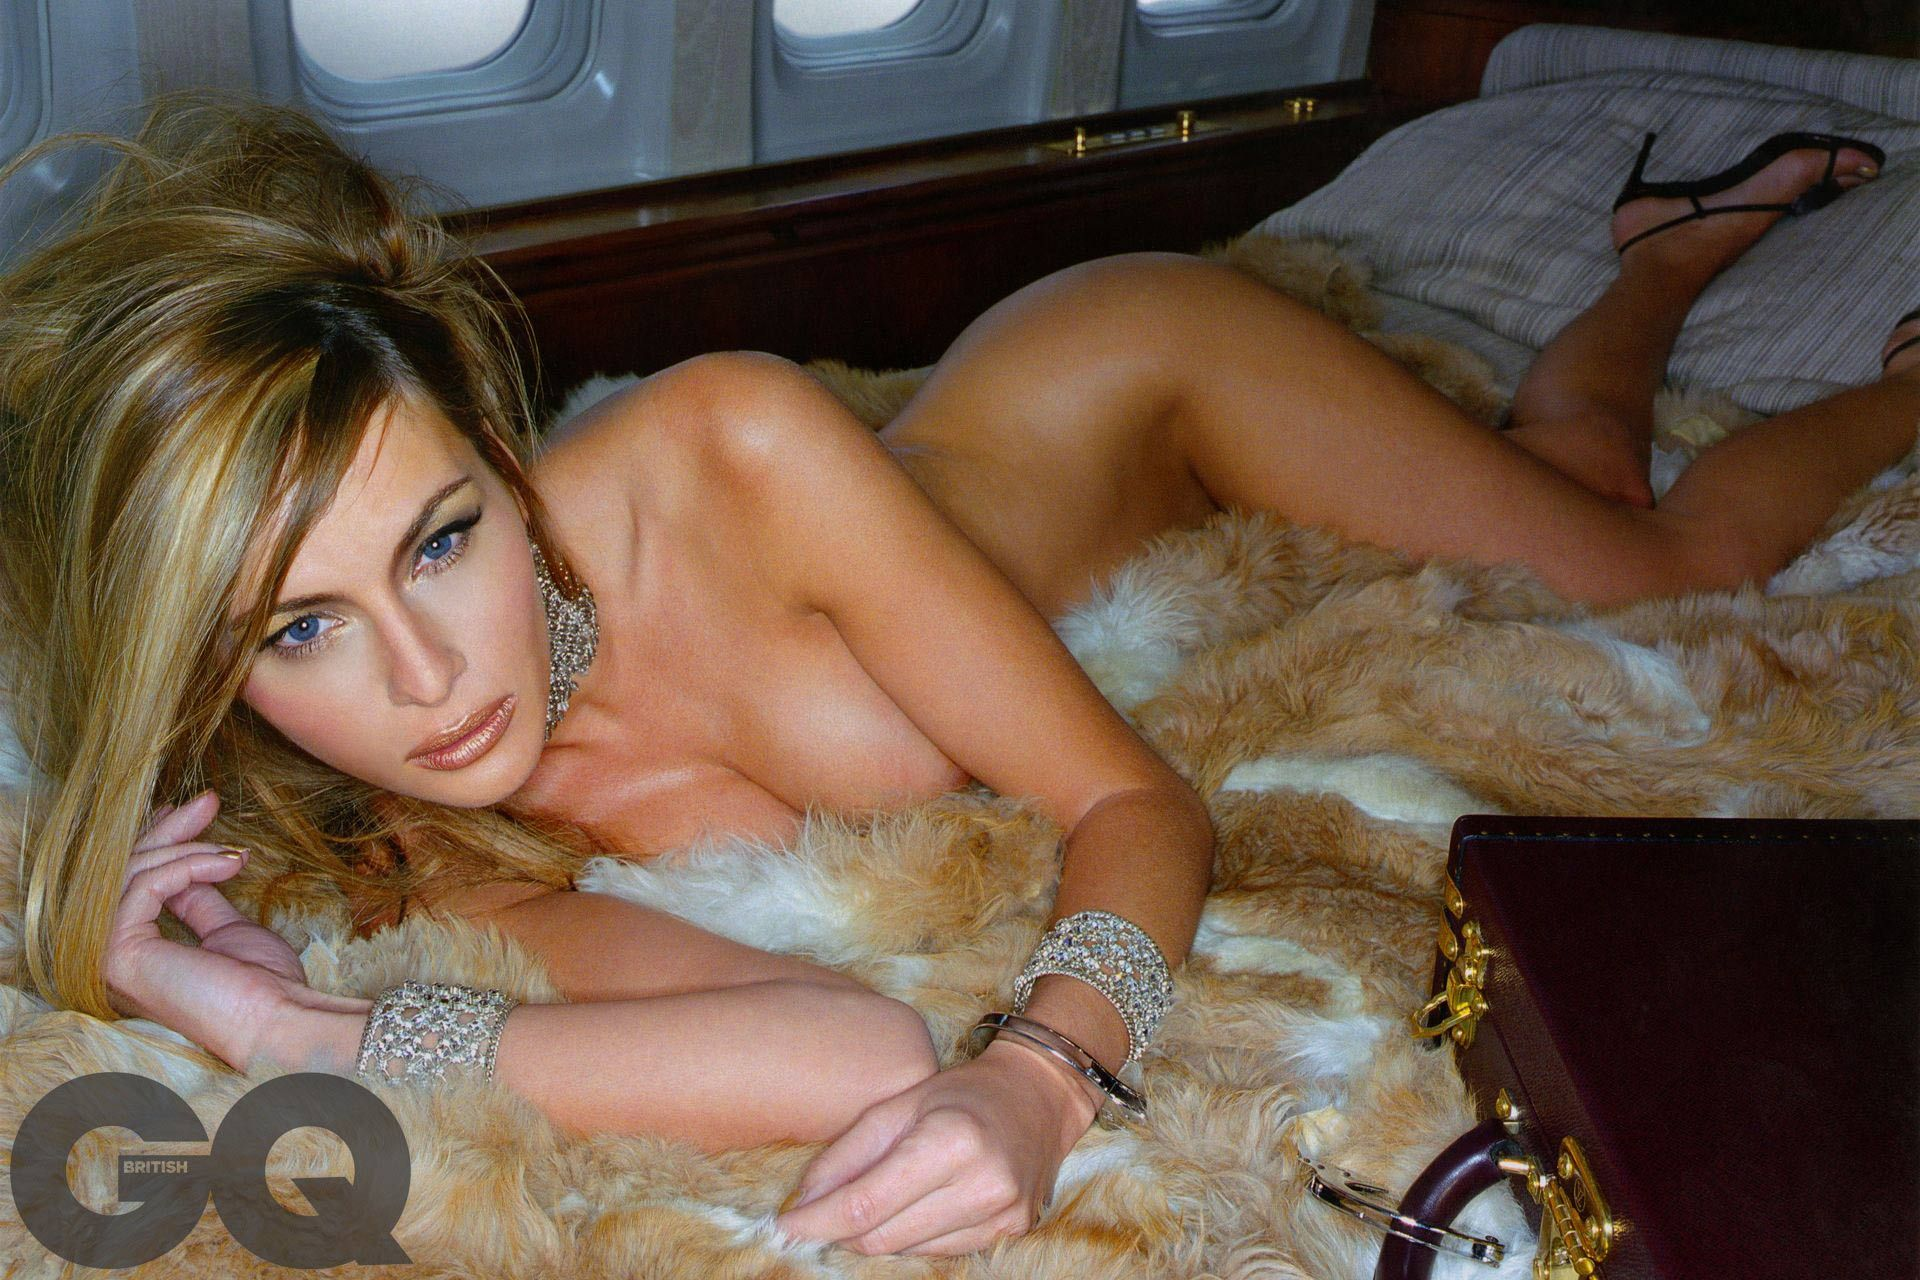 Dirty Scandalous Photos Of Melania Trump photo 27